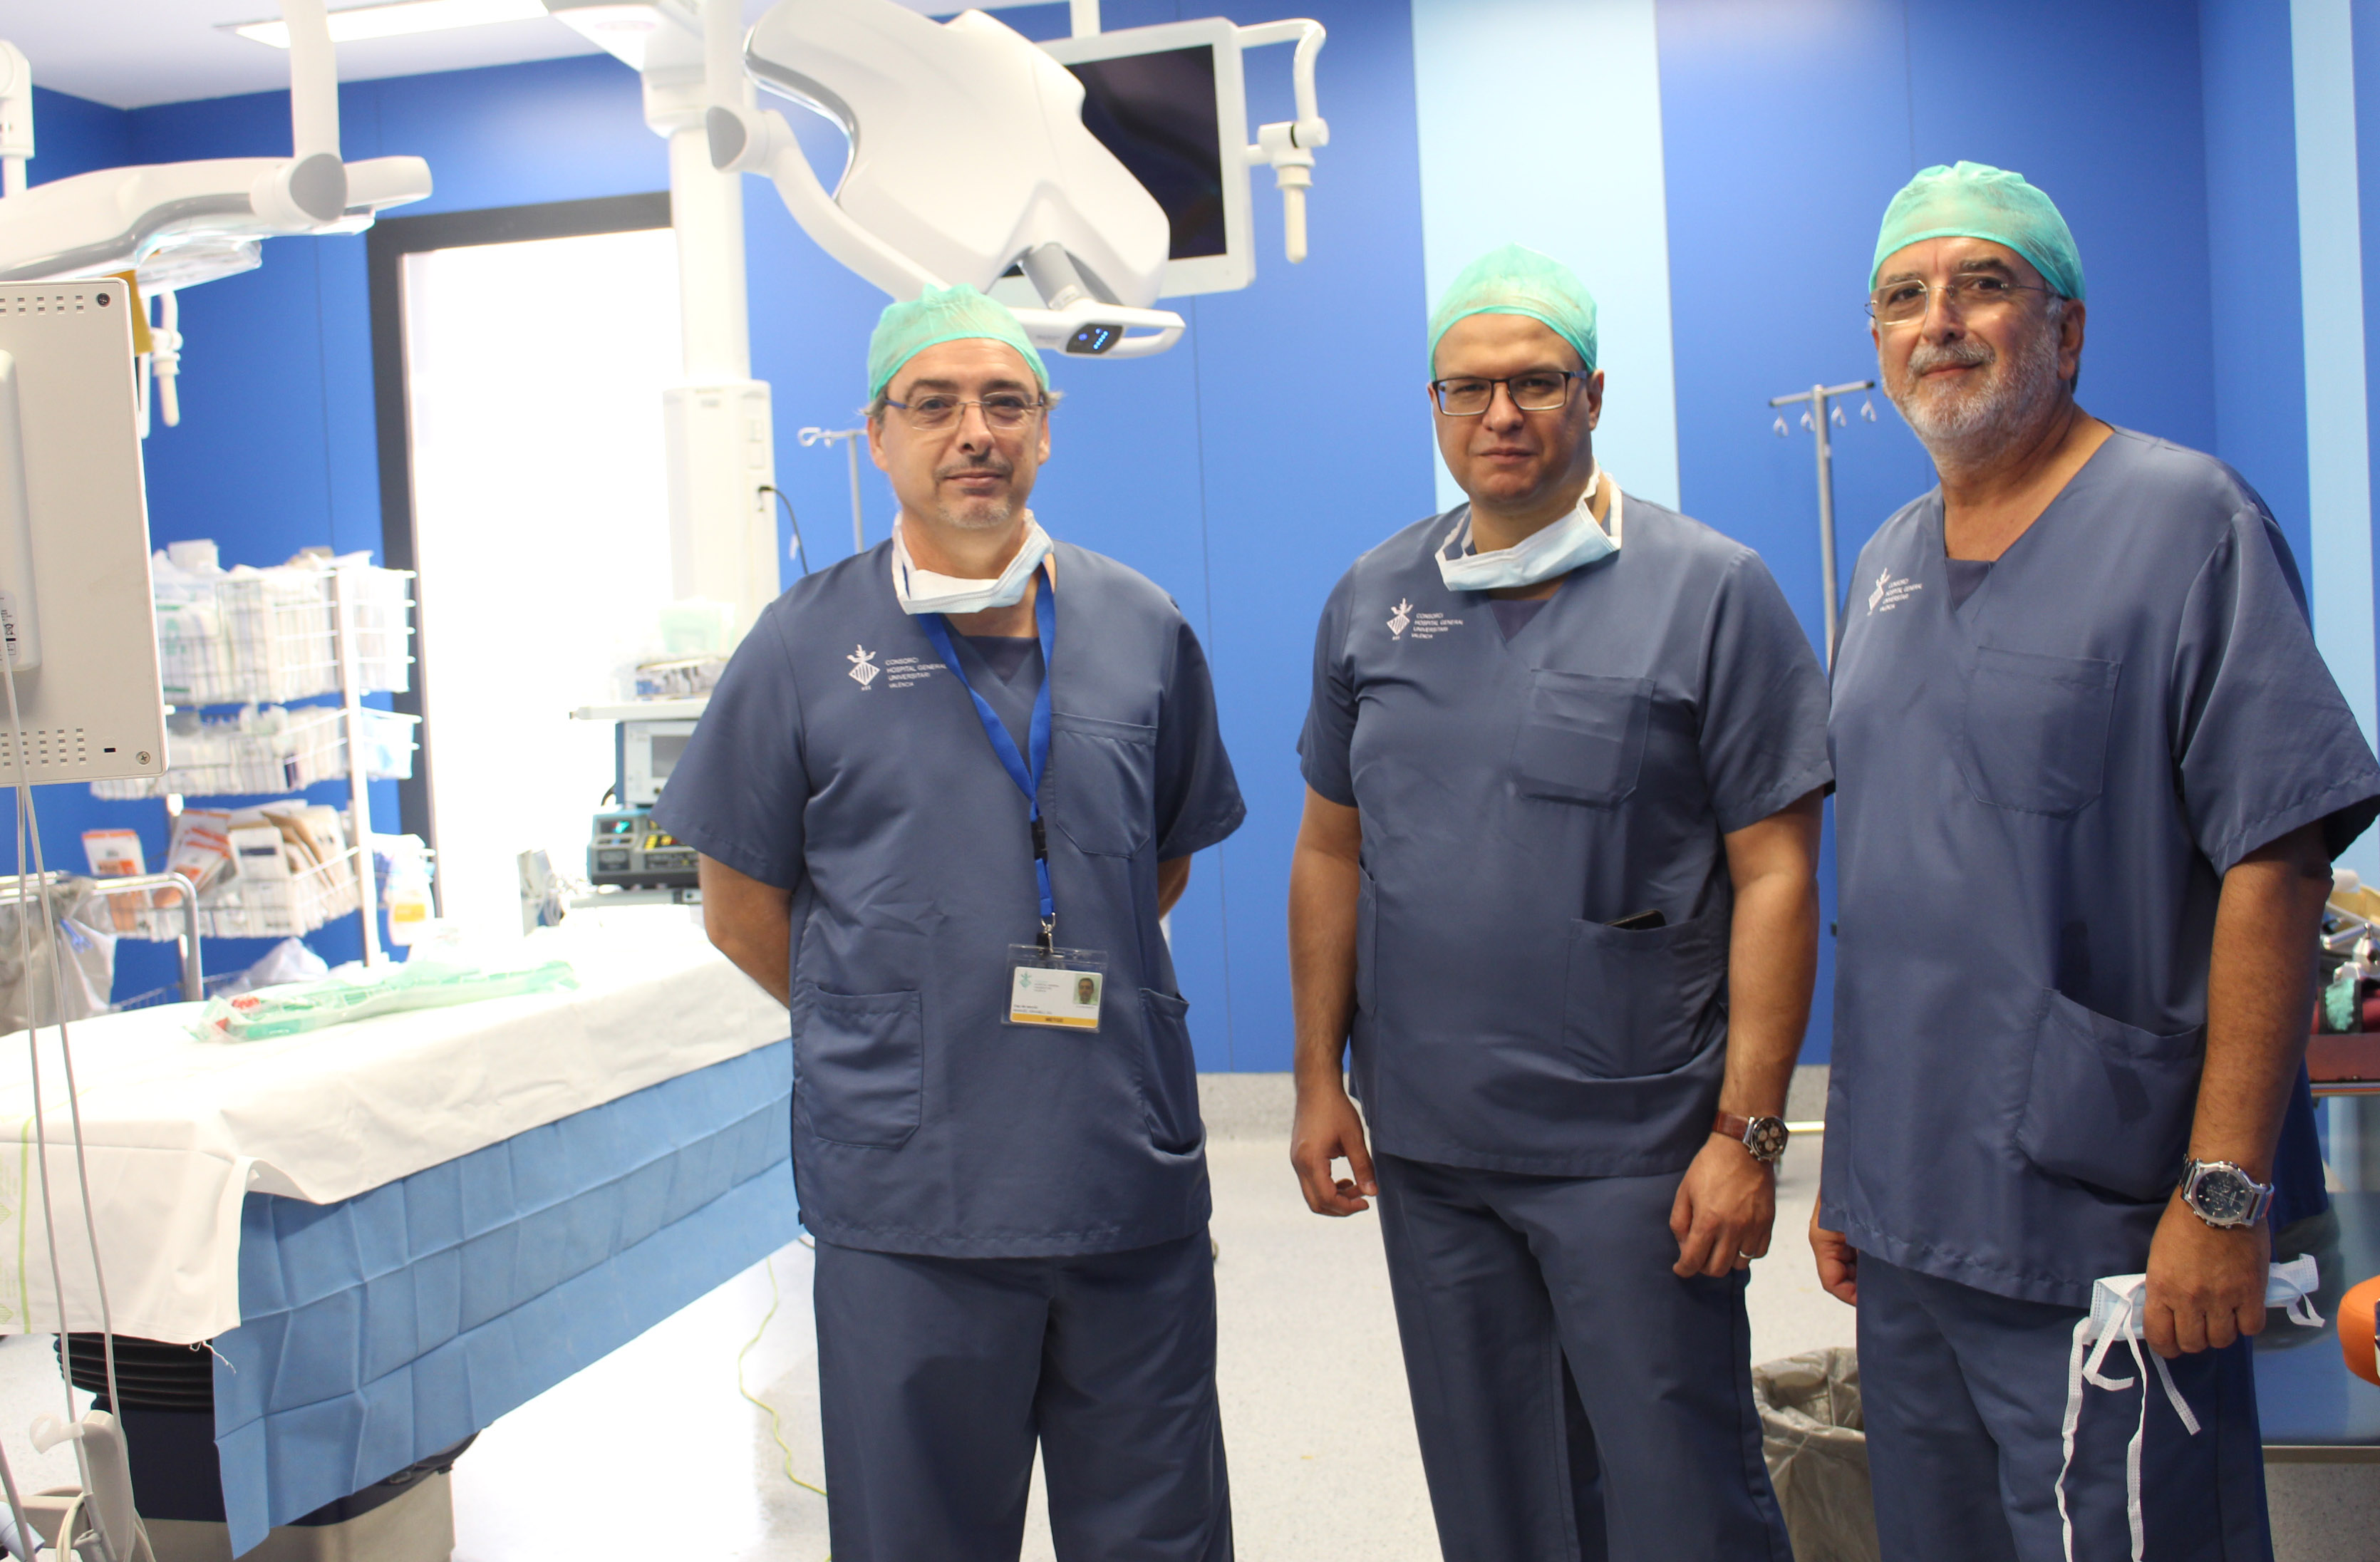 2017 10 03 Mohamed R. Tahan visita edificio quirugico HGUV